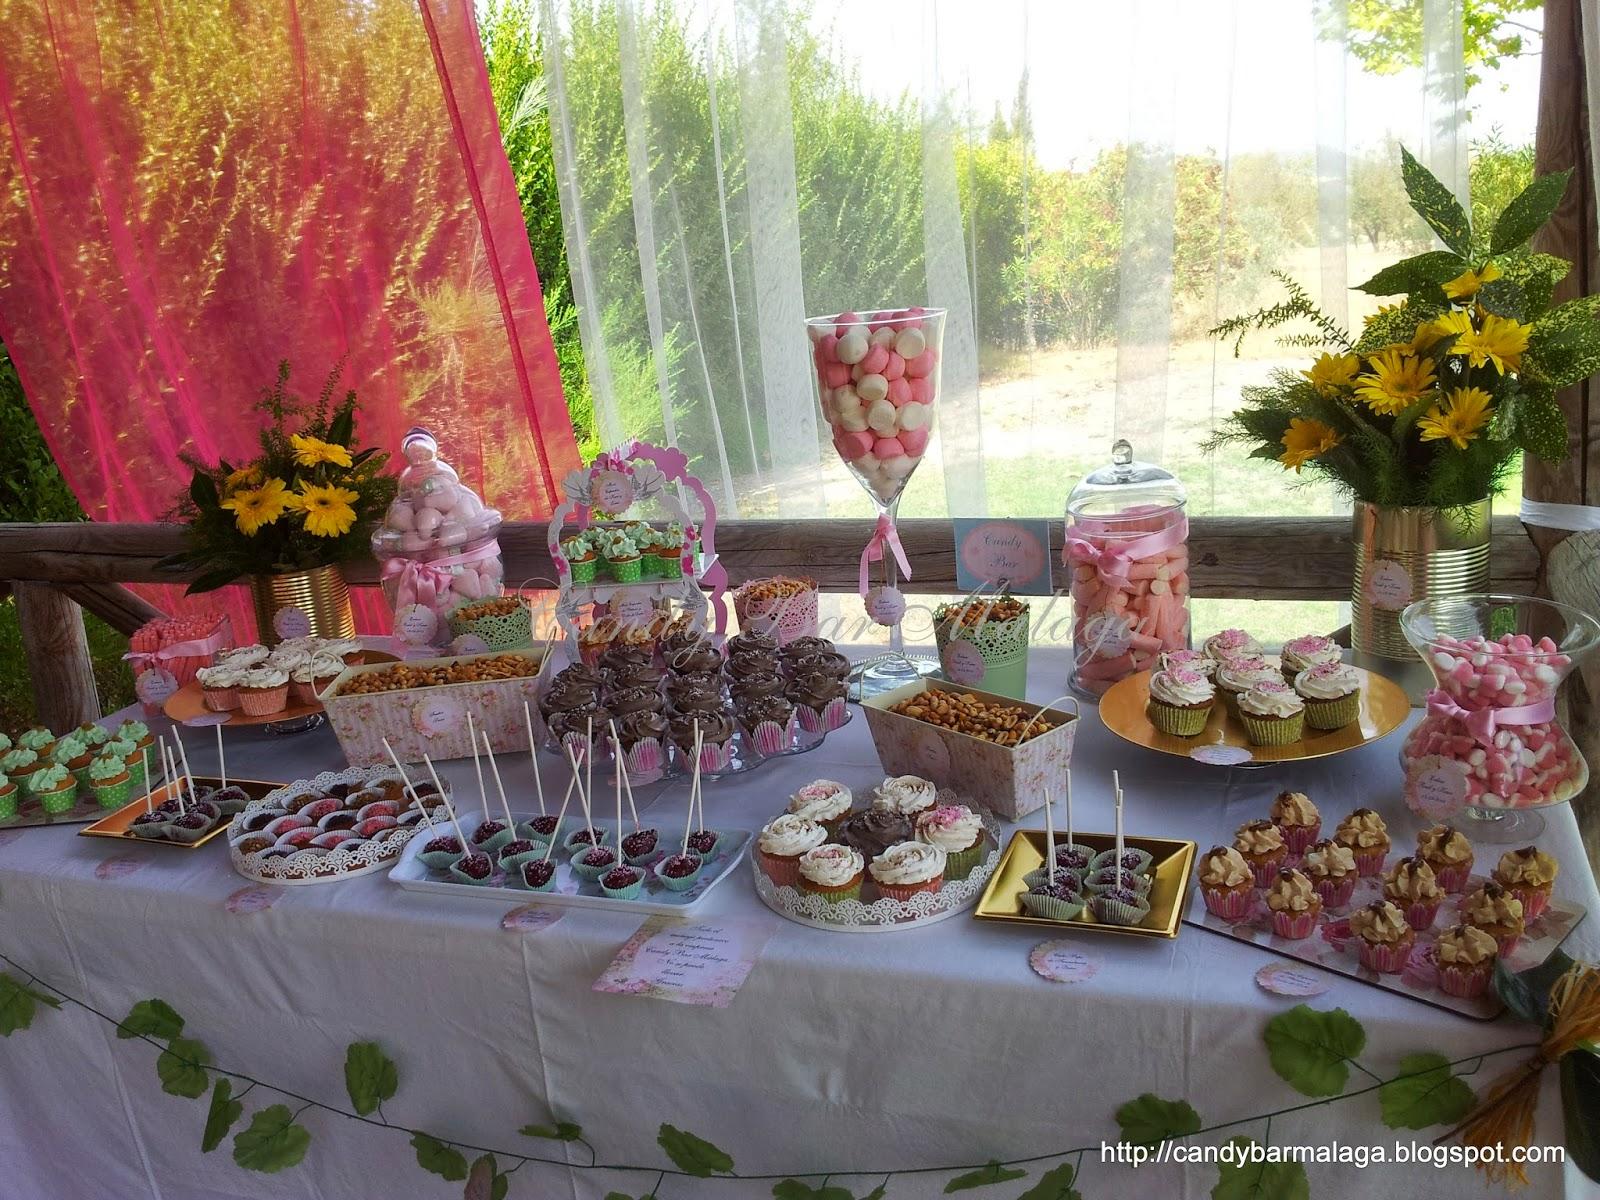 Candy bar m laga mesa dulce boda de ra l y kesia - Decoracion malaga ...